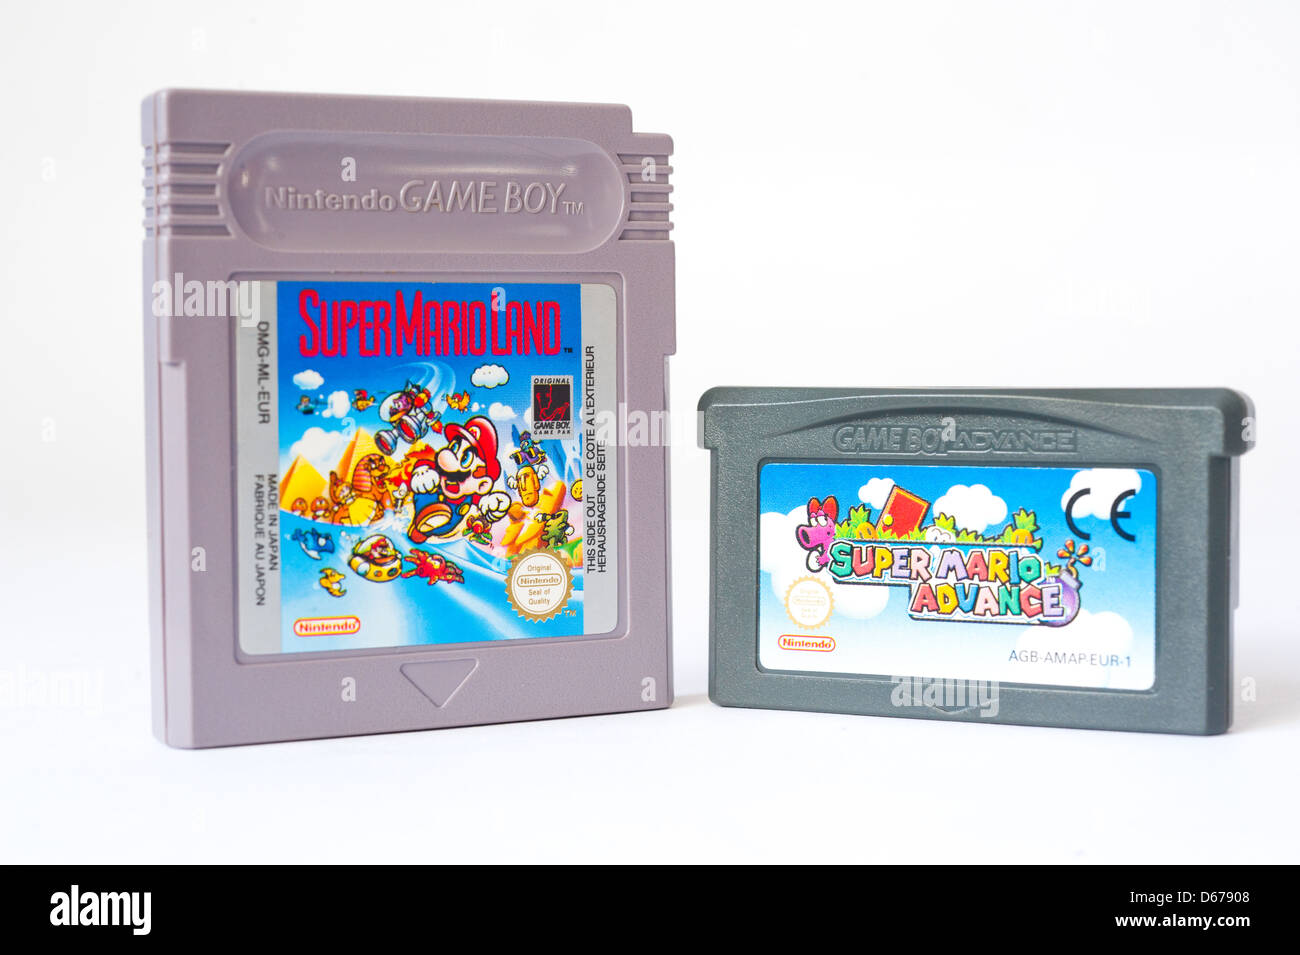 Original Nintendo Game Boy cartridge and Game Boy Advance cartridge - Stock Image